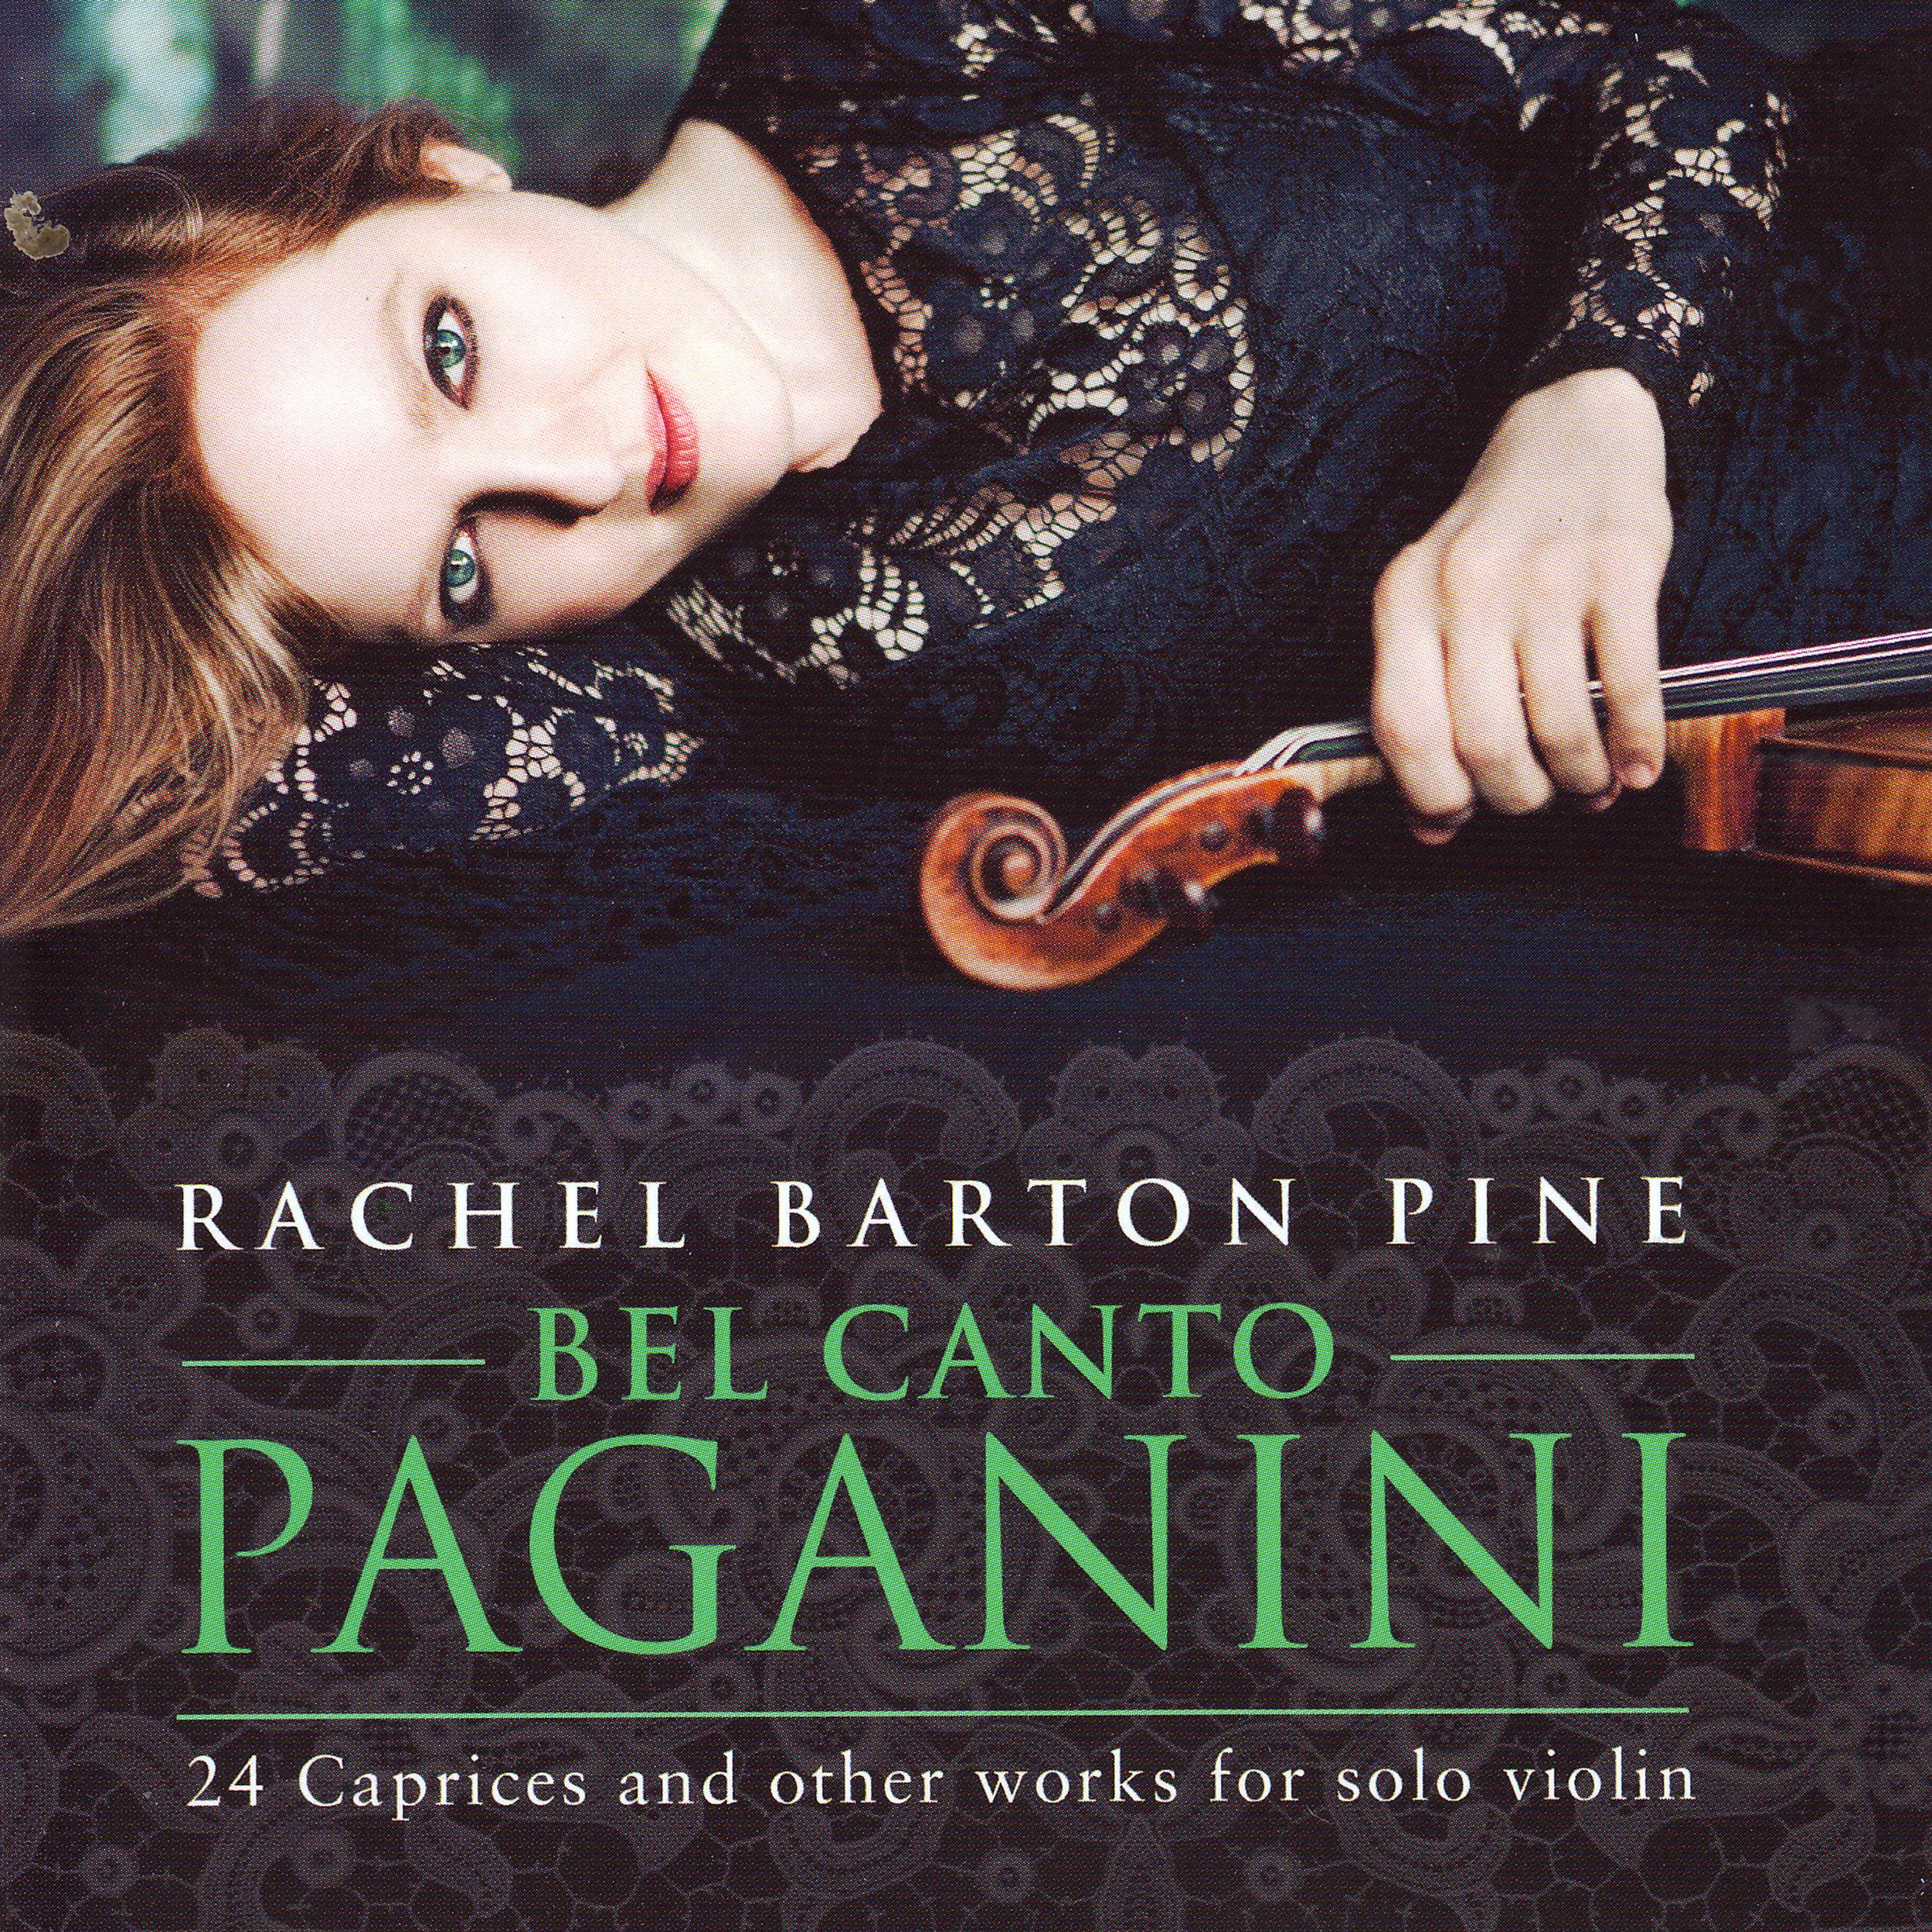 rachel barton pine paganini.jpg